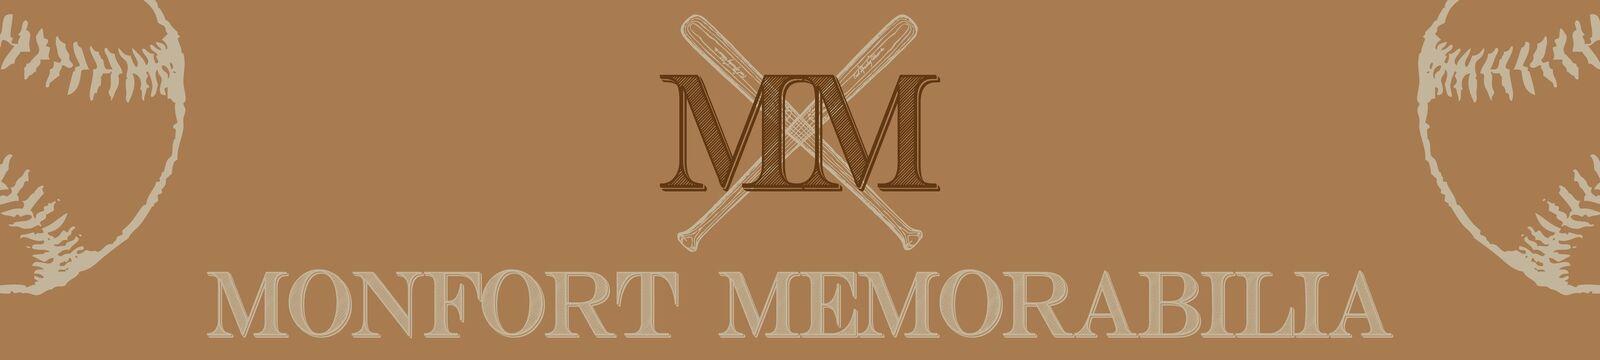 Monfort Memorabilia